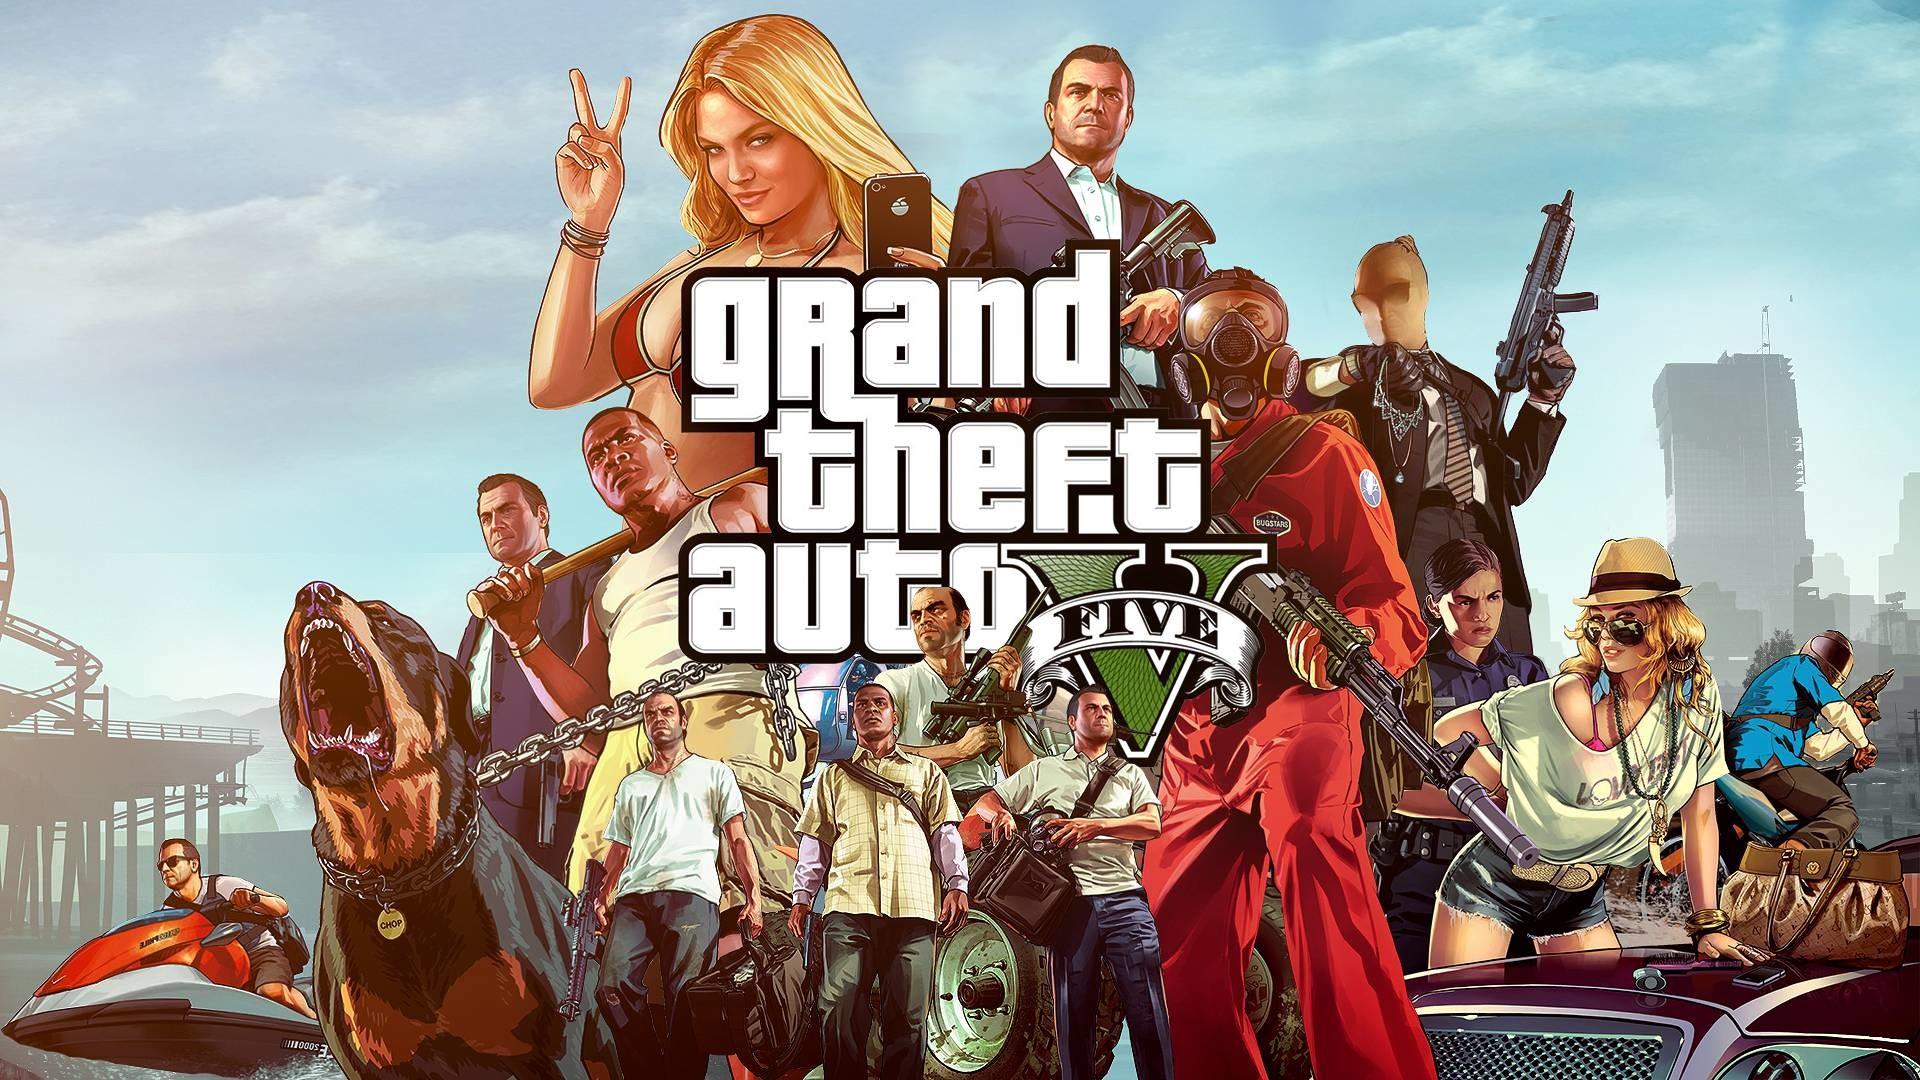 Grand Theft Auto 5 Gta V Wallpaper 40134 in Games – Telusers.com